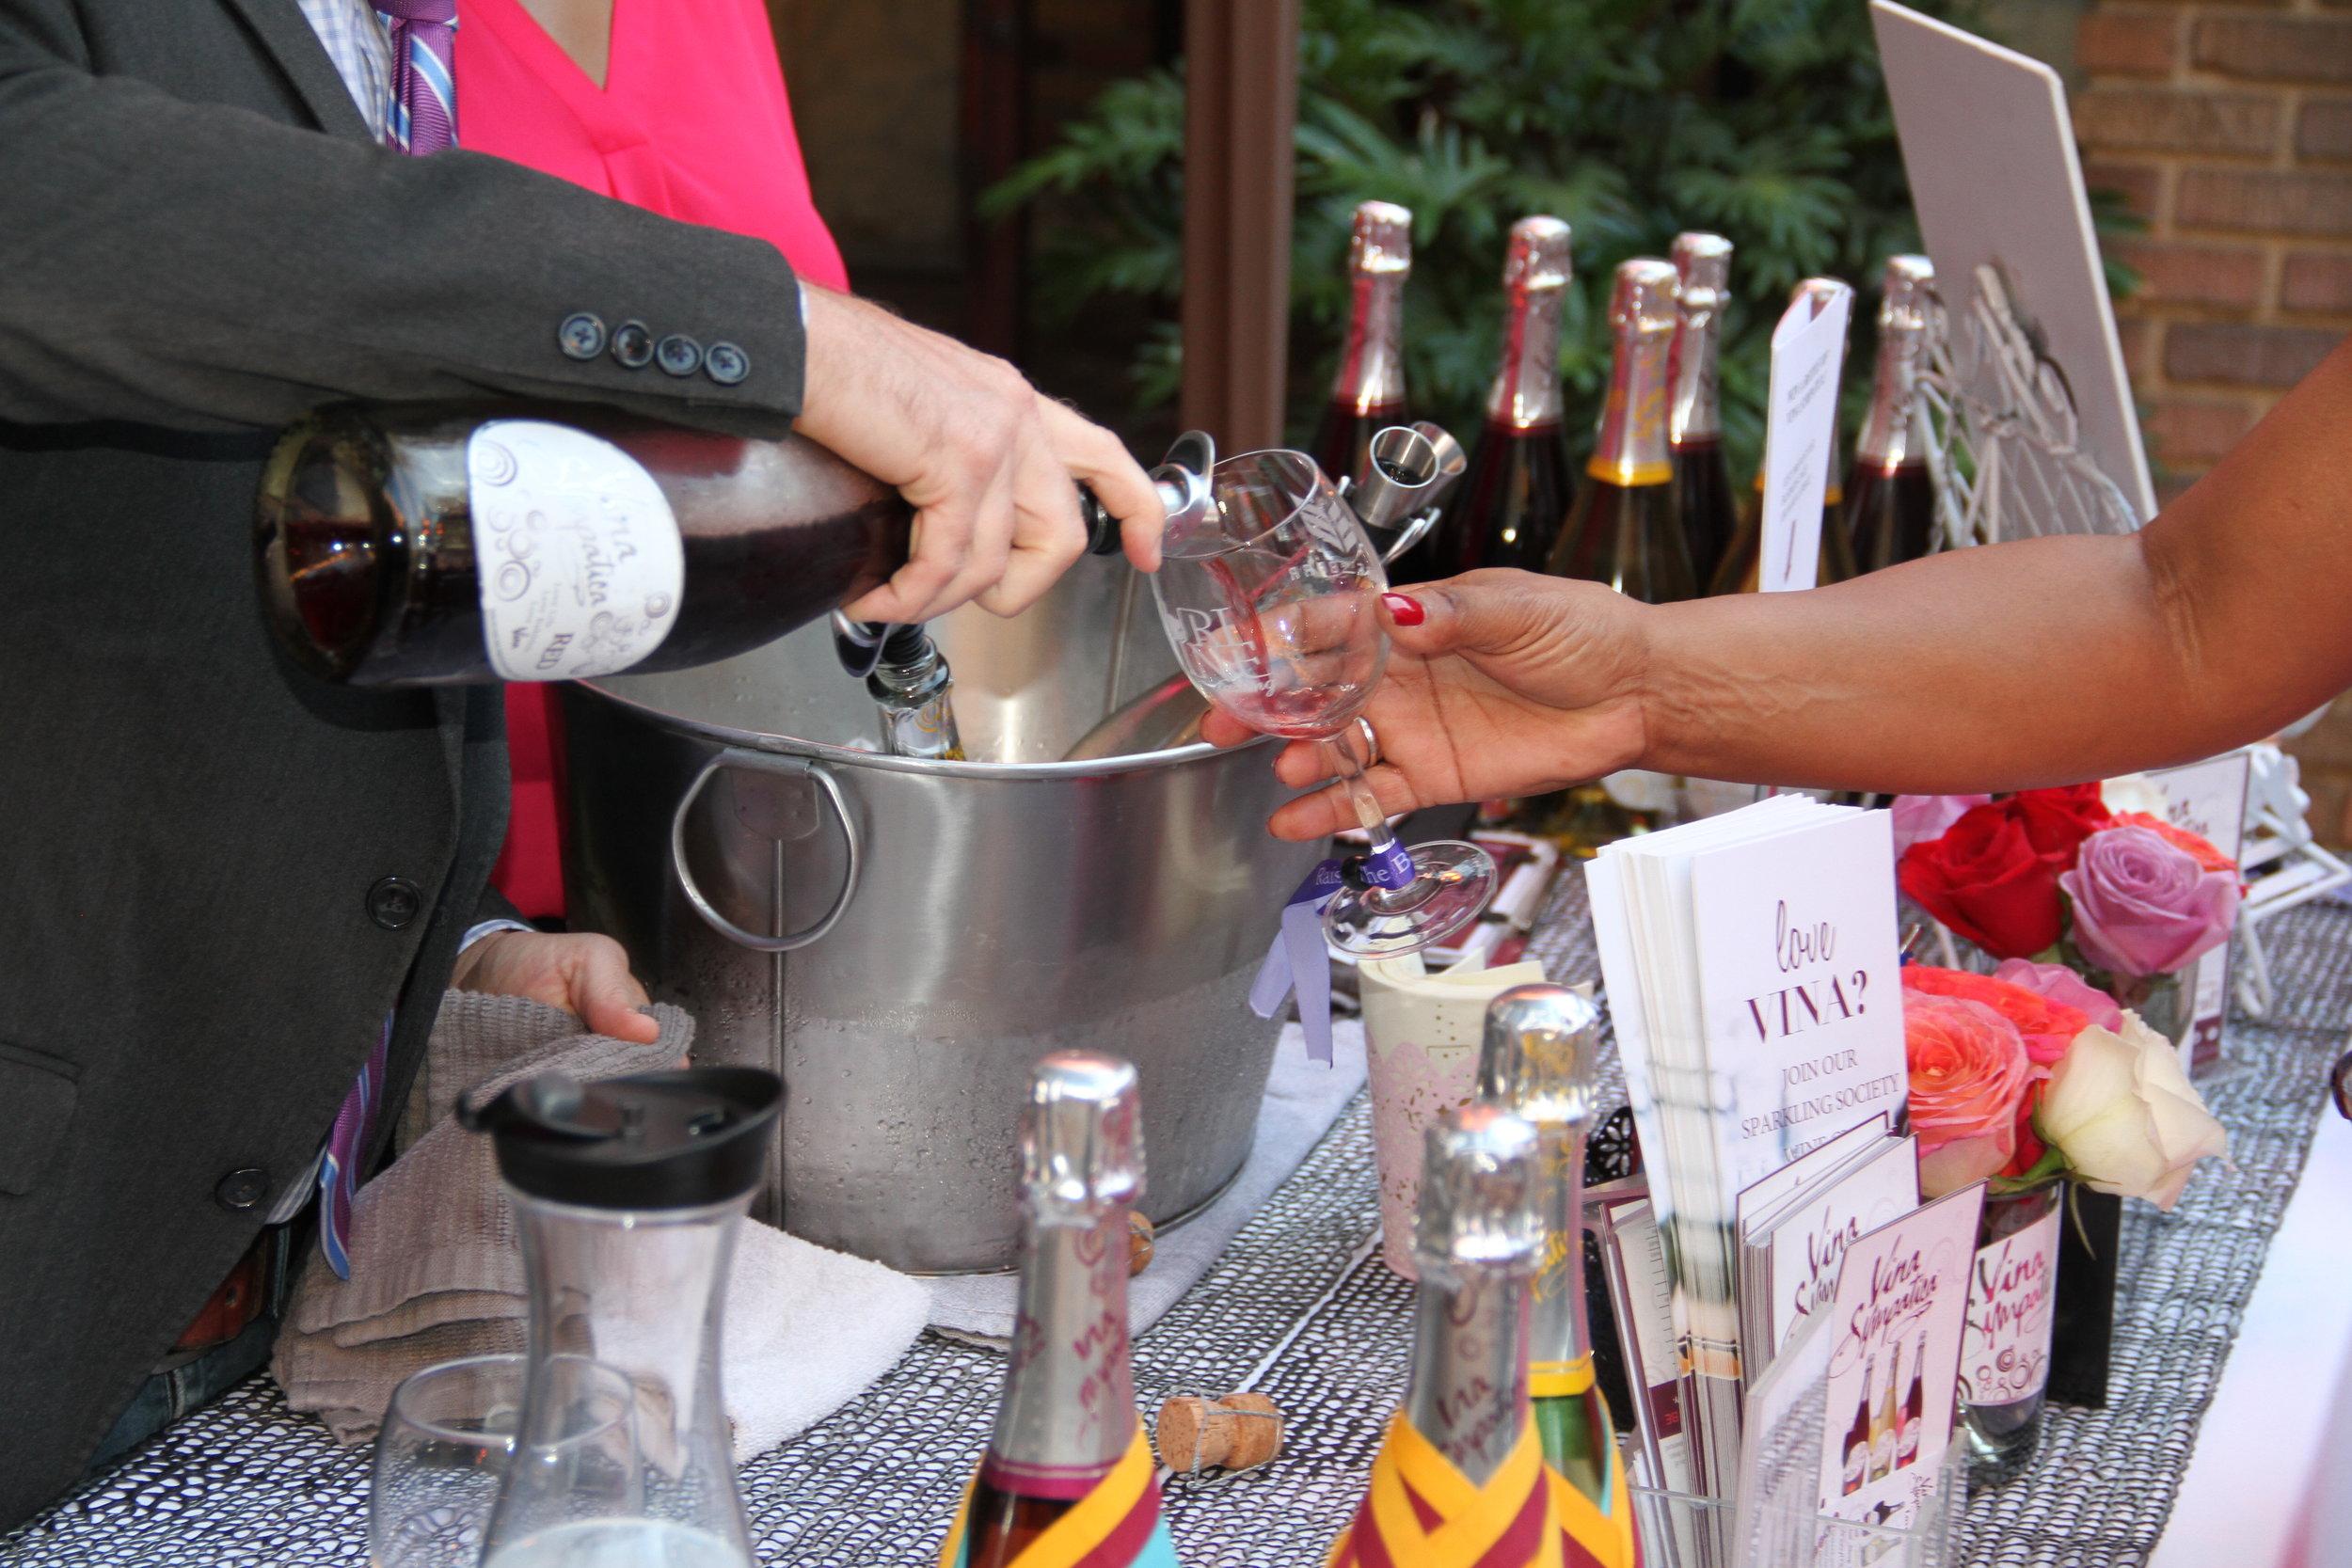 Anthony Barr's Wine Tasting Fundraiser